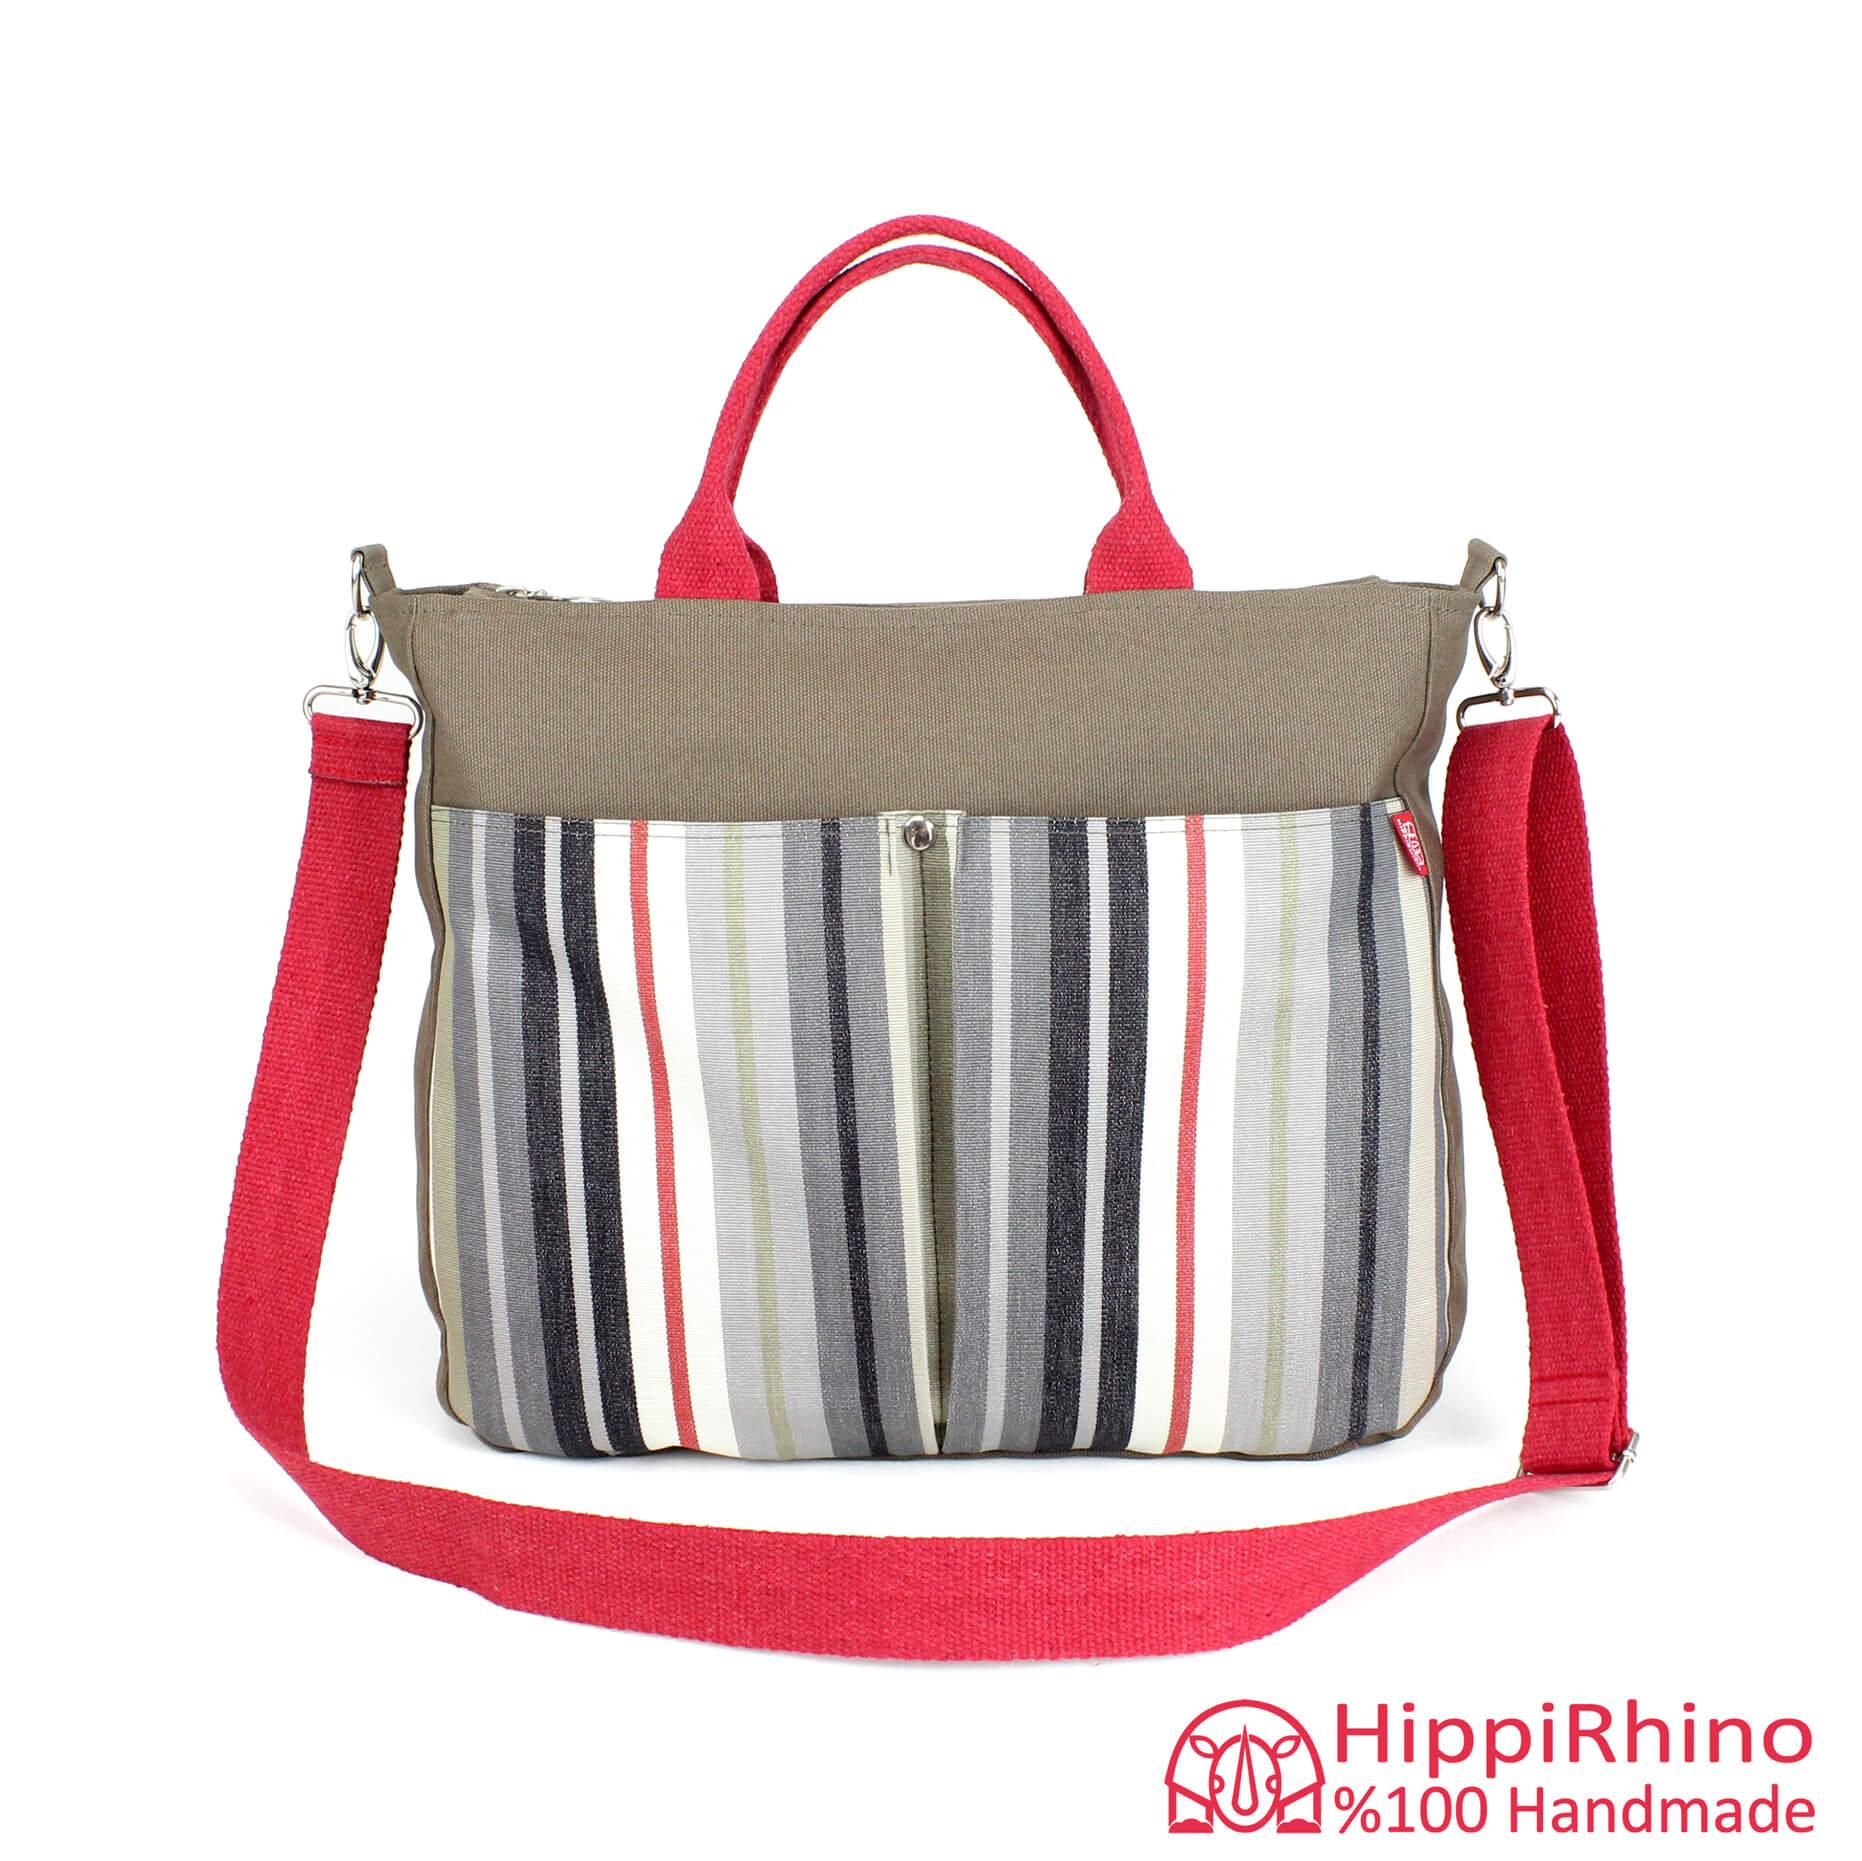 cd354fa9c8b Striped Bag Fashion Tote Canvas Bag Handbag Colorful Cotton Strap Handle  Pocket Bag Gift For Her Bridesmaids Church Bag Sturdy Diaper Bag